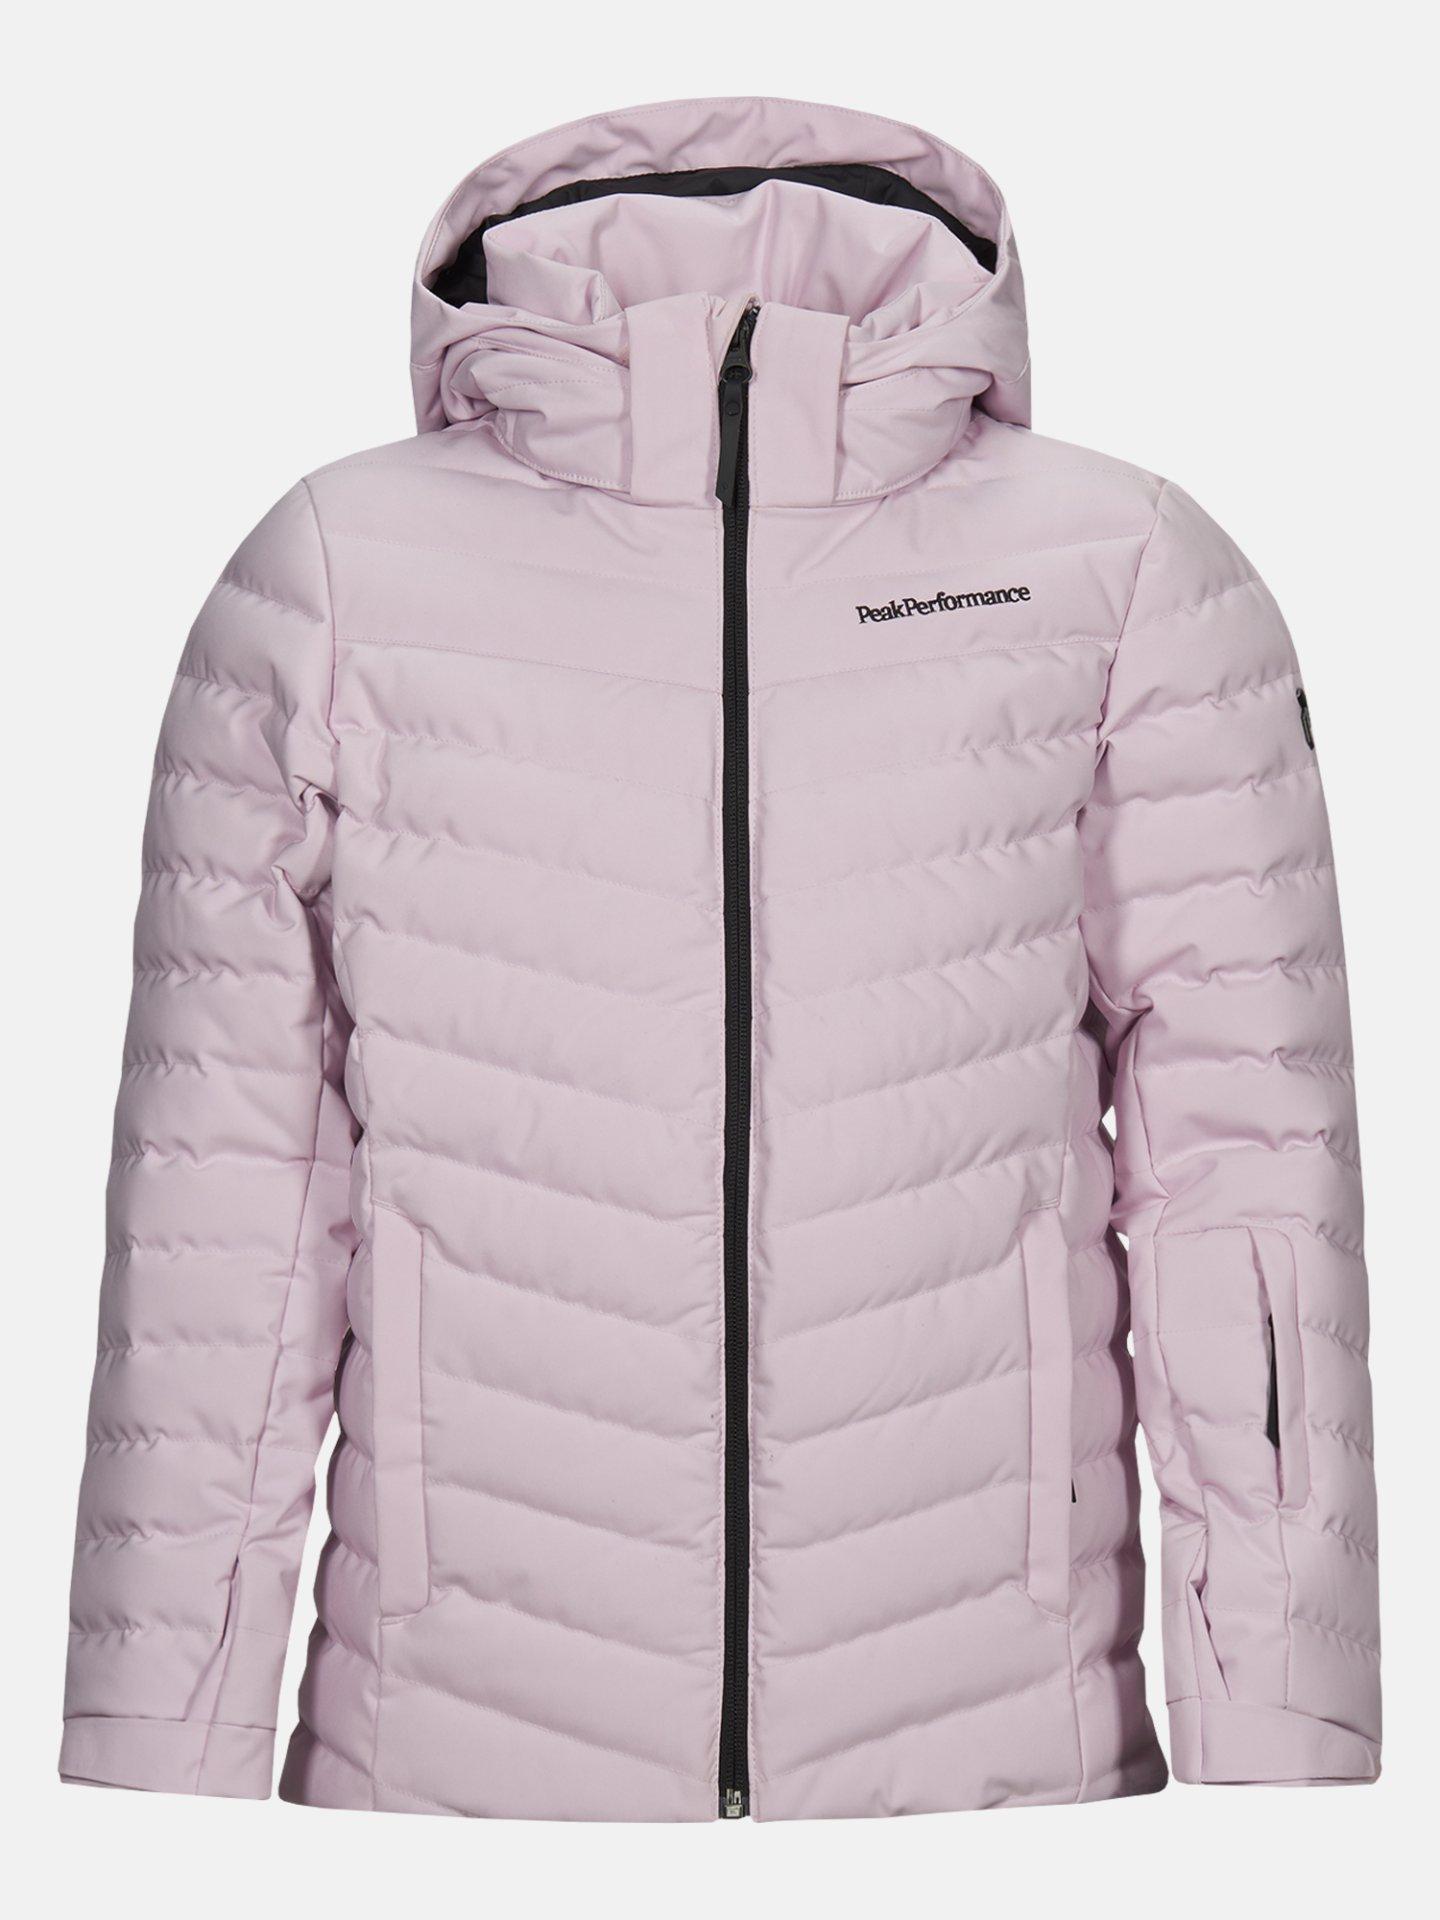 Peak Performance Girls Frost Ski Jacket 2021